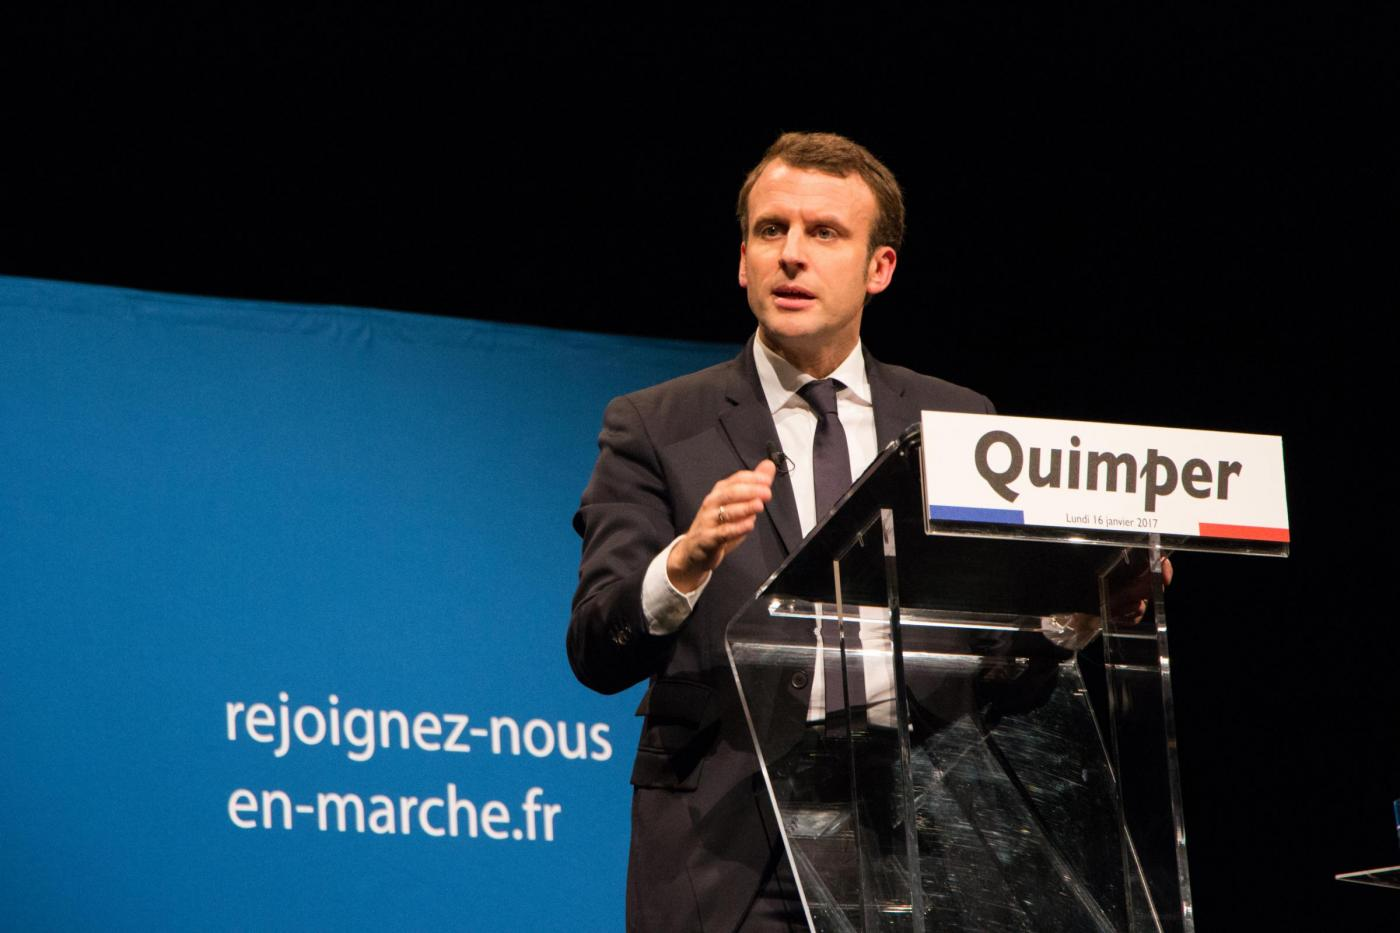 Emmanuel Macron in in campagna elettorale in Bretagna